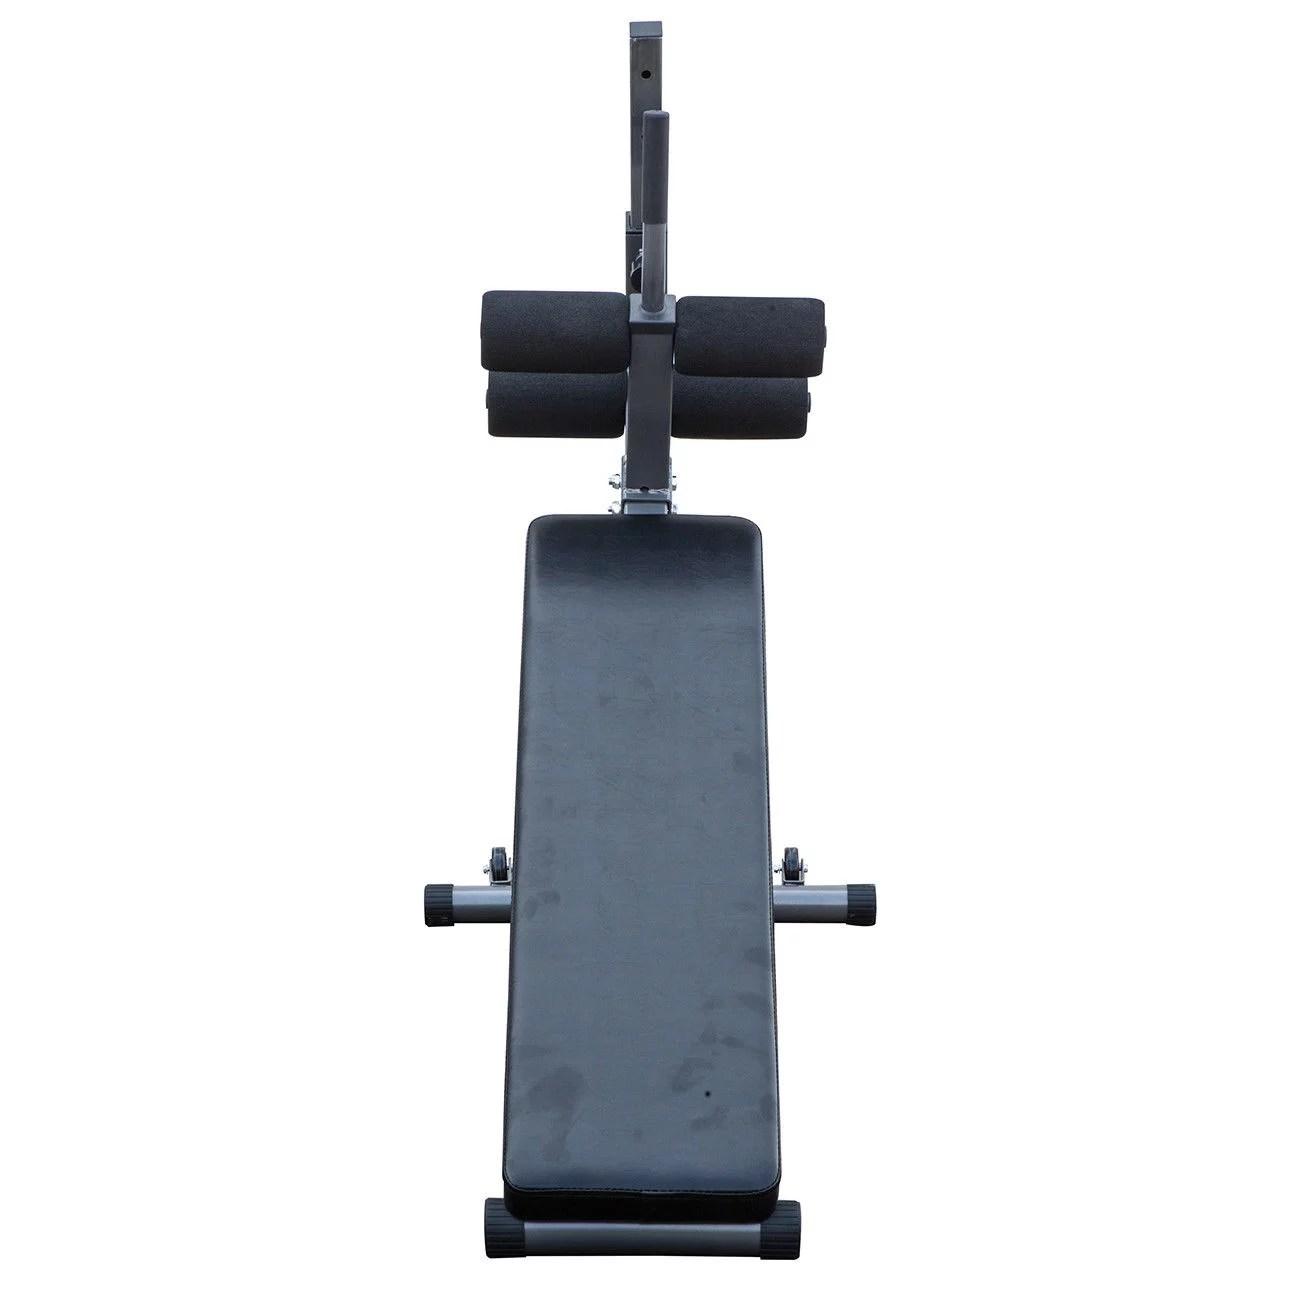 Ghp Gray Steel 56 Quot Lx23 5 Quot Wx52 Quot H 12 Position Freestanding